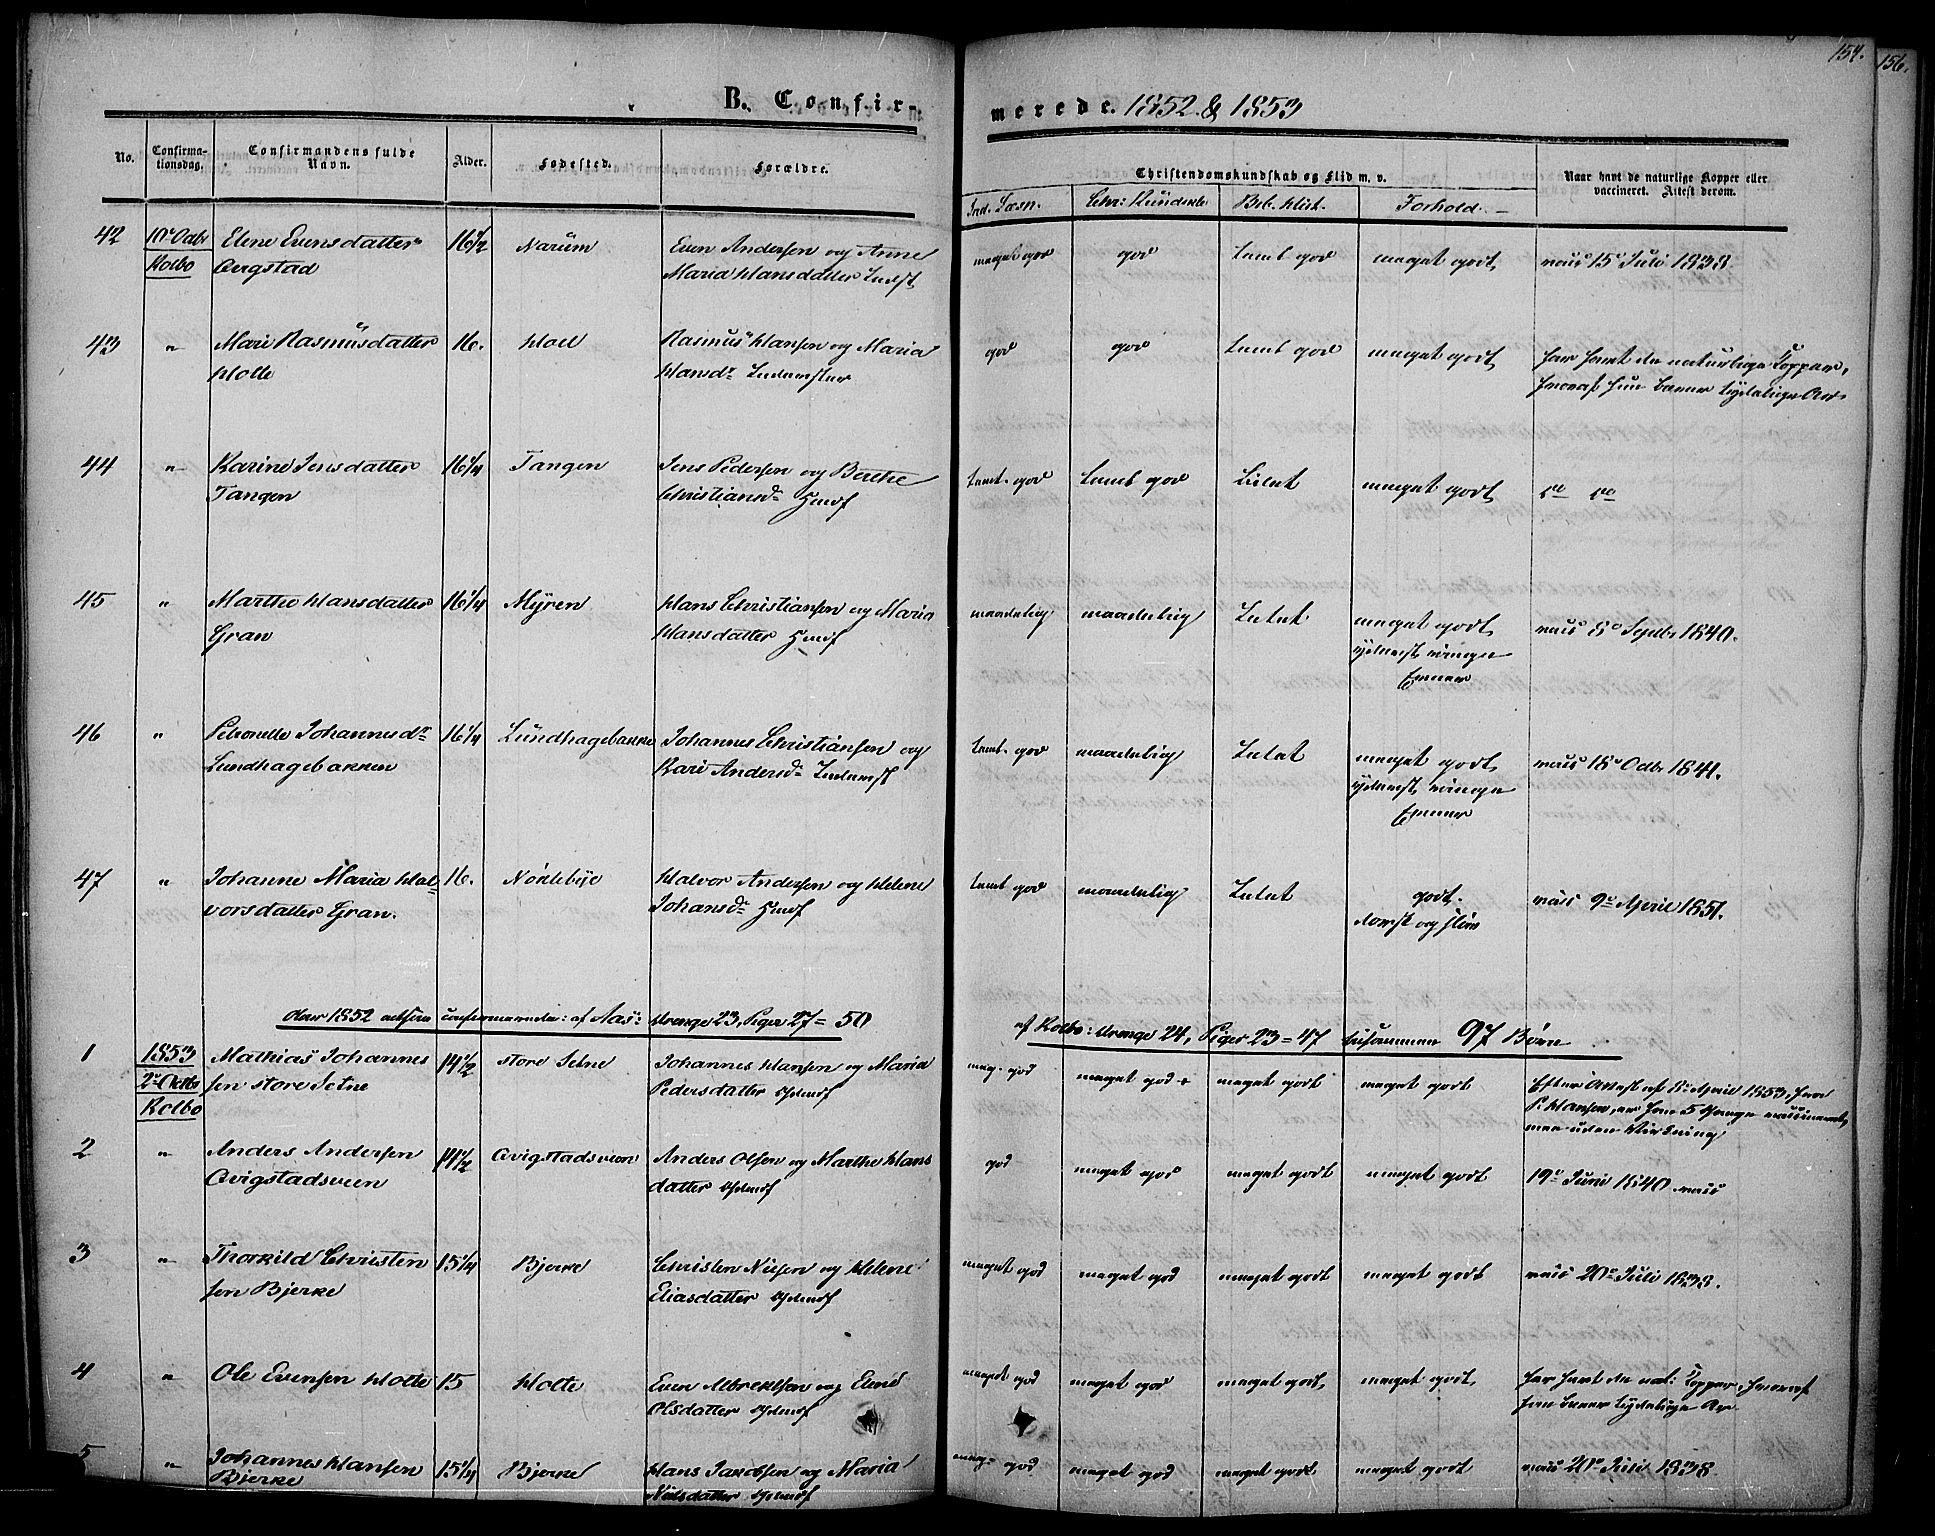 SAH, Vestre Toten prestekontor, H/Ha/Haa/L0005: Ministerialbok nr. 5, 1850-1855, s. 154